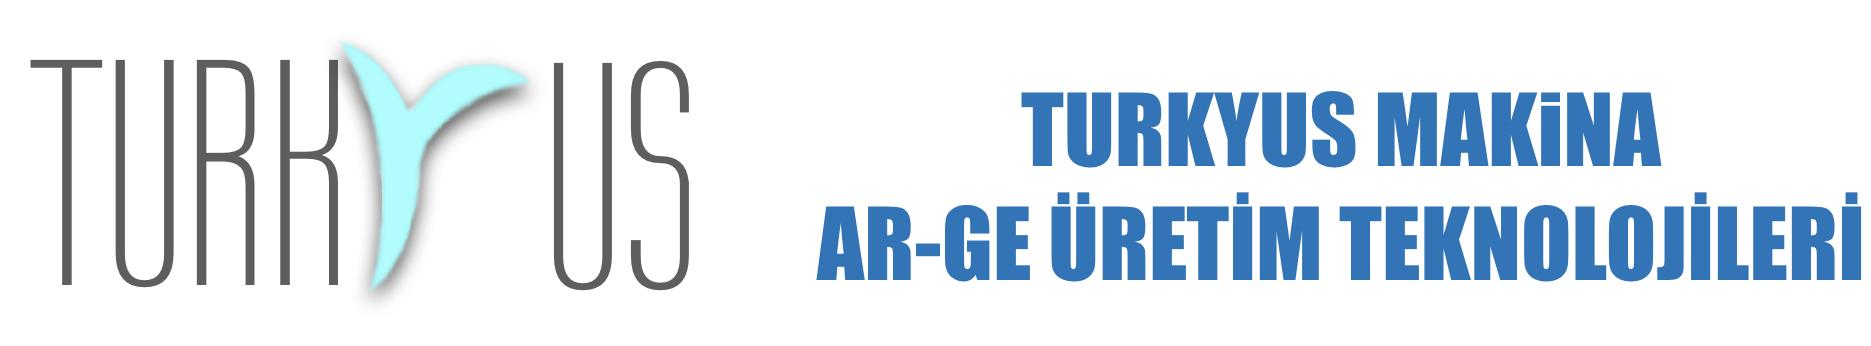 TurkYus Makina Ar-Ge Üretim Teknolojileri